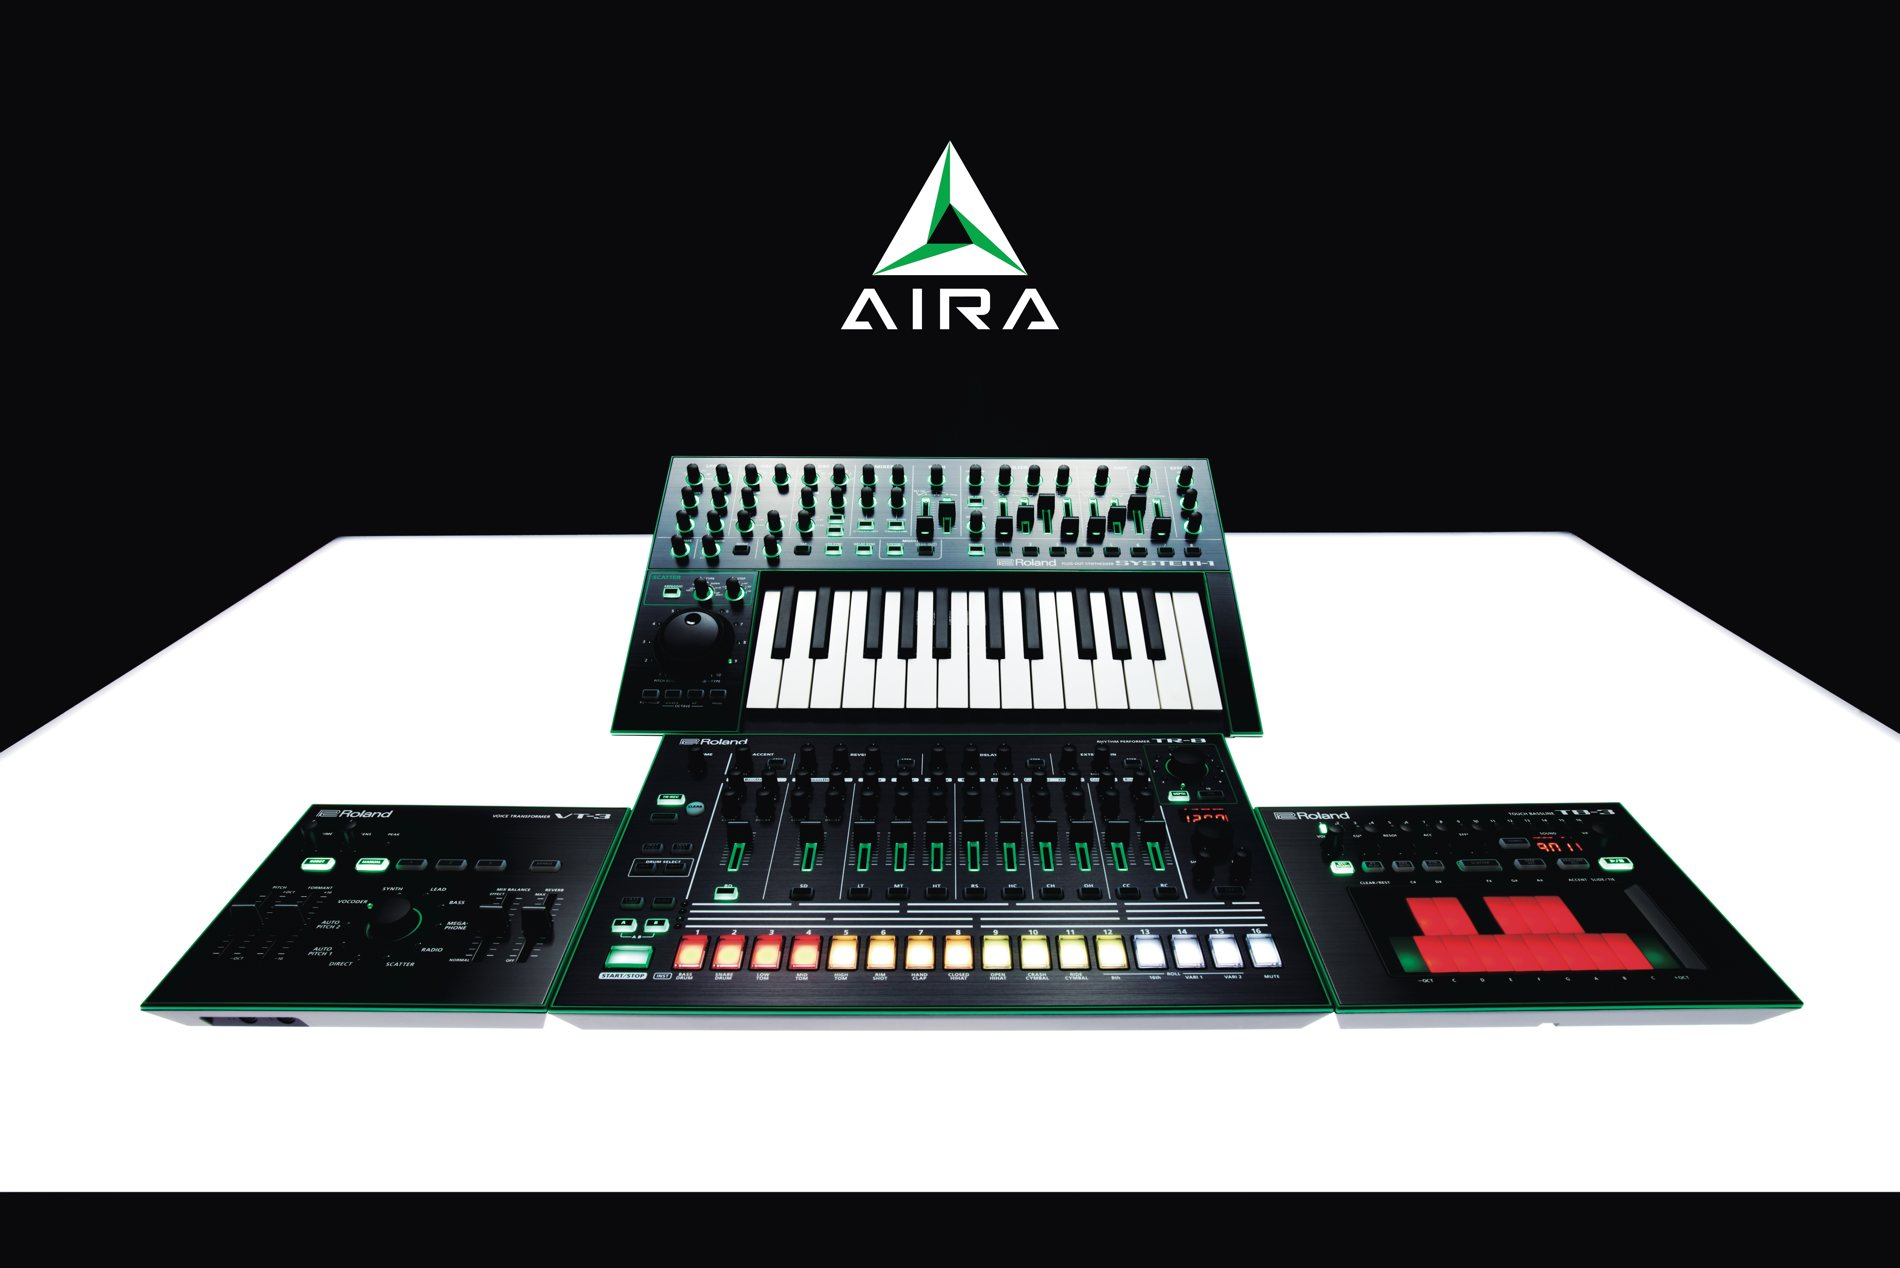 Roland Aira - nebe gandas